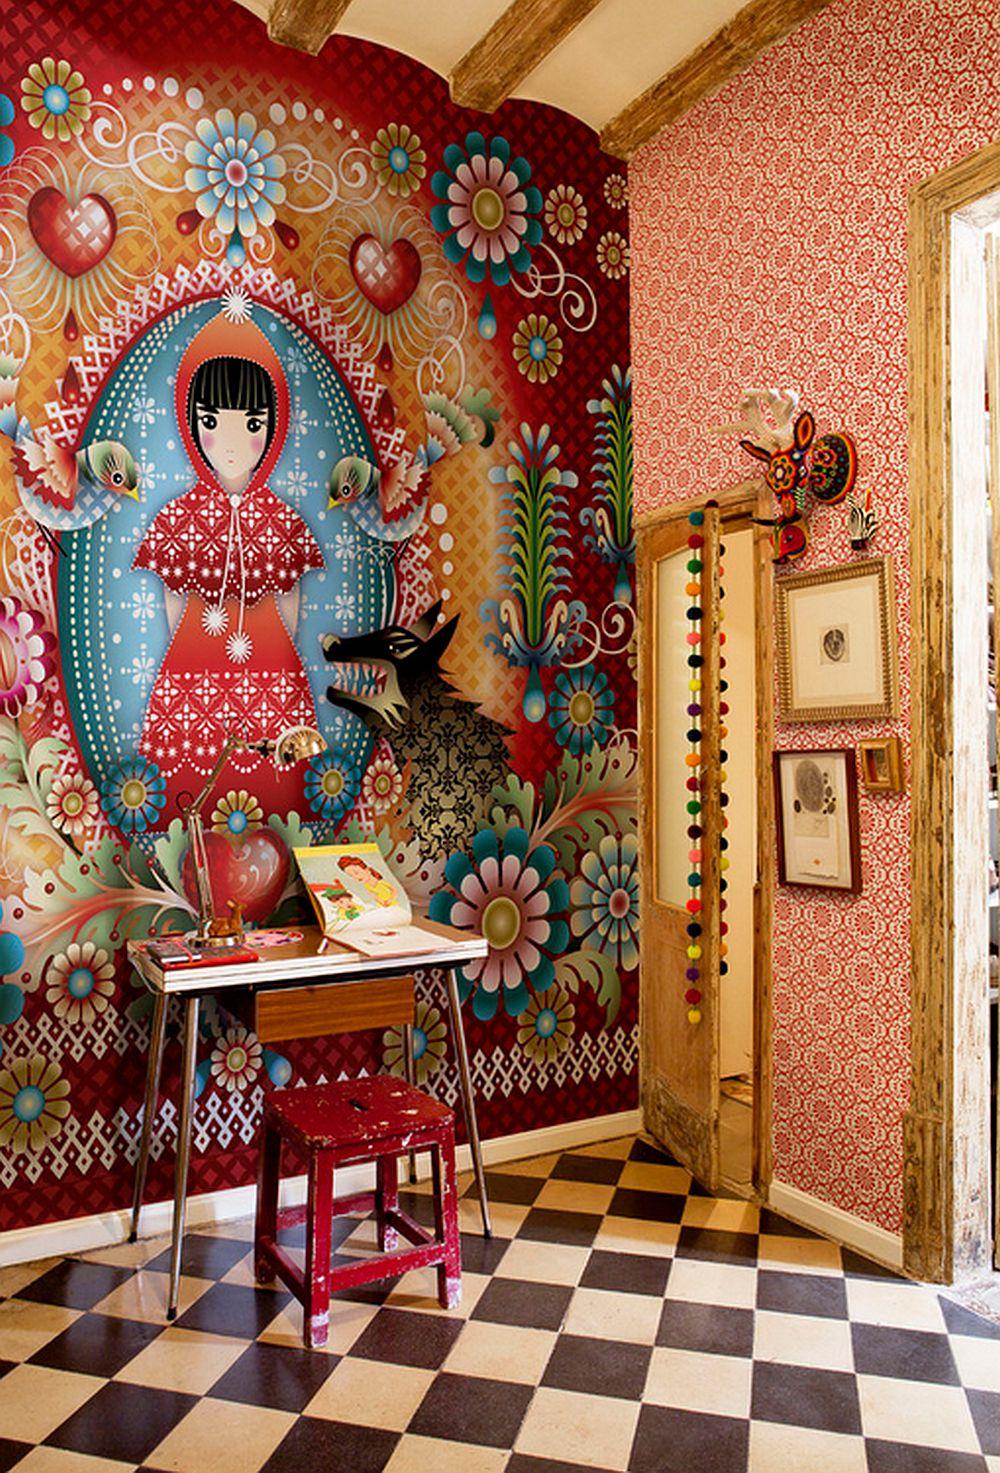 adelaparvu.com despre tapete colorate si unicate create de Catalina Estrada, Foto  (12)